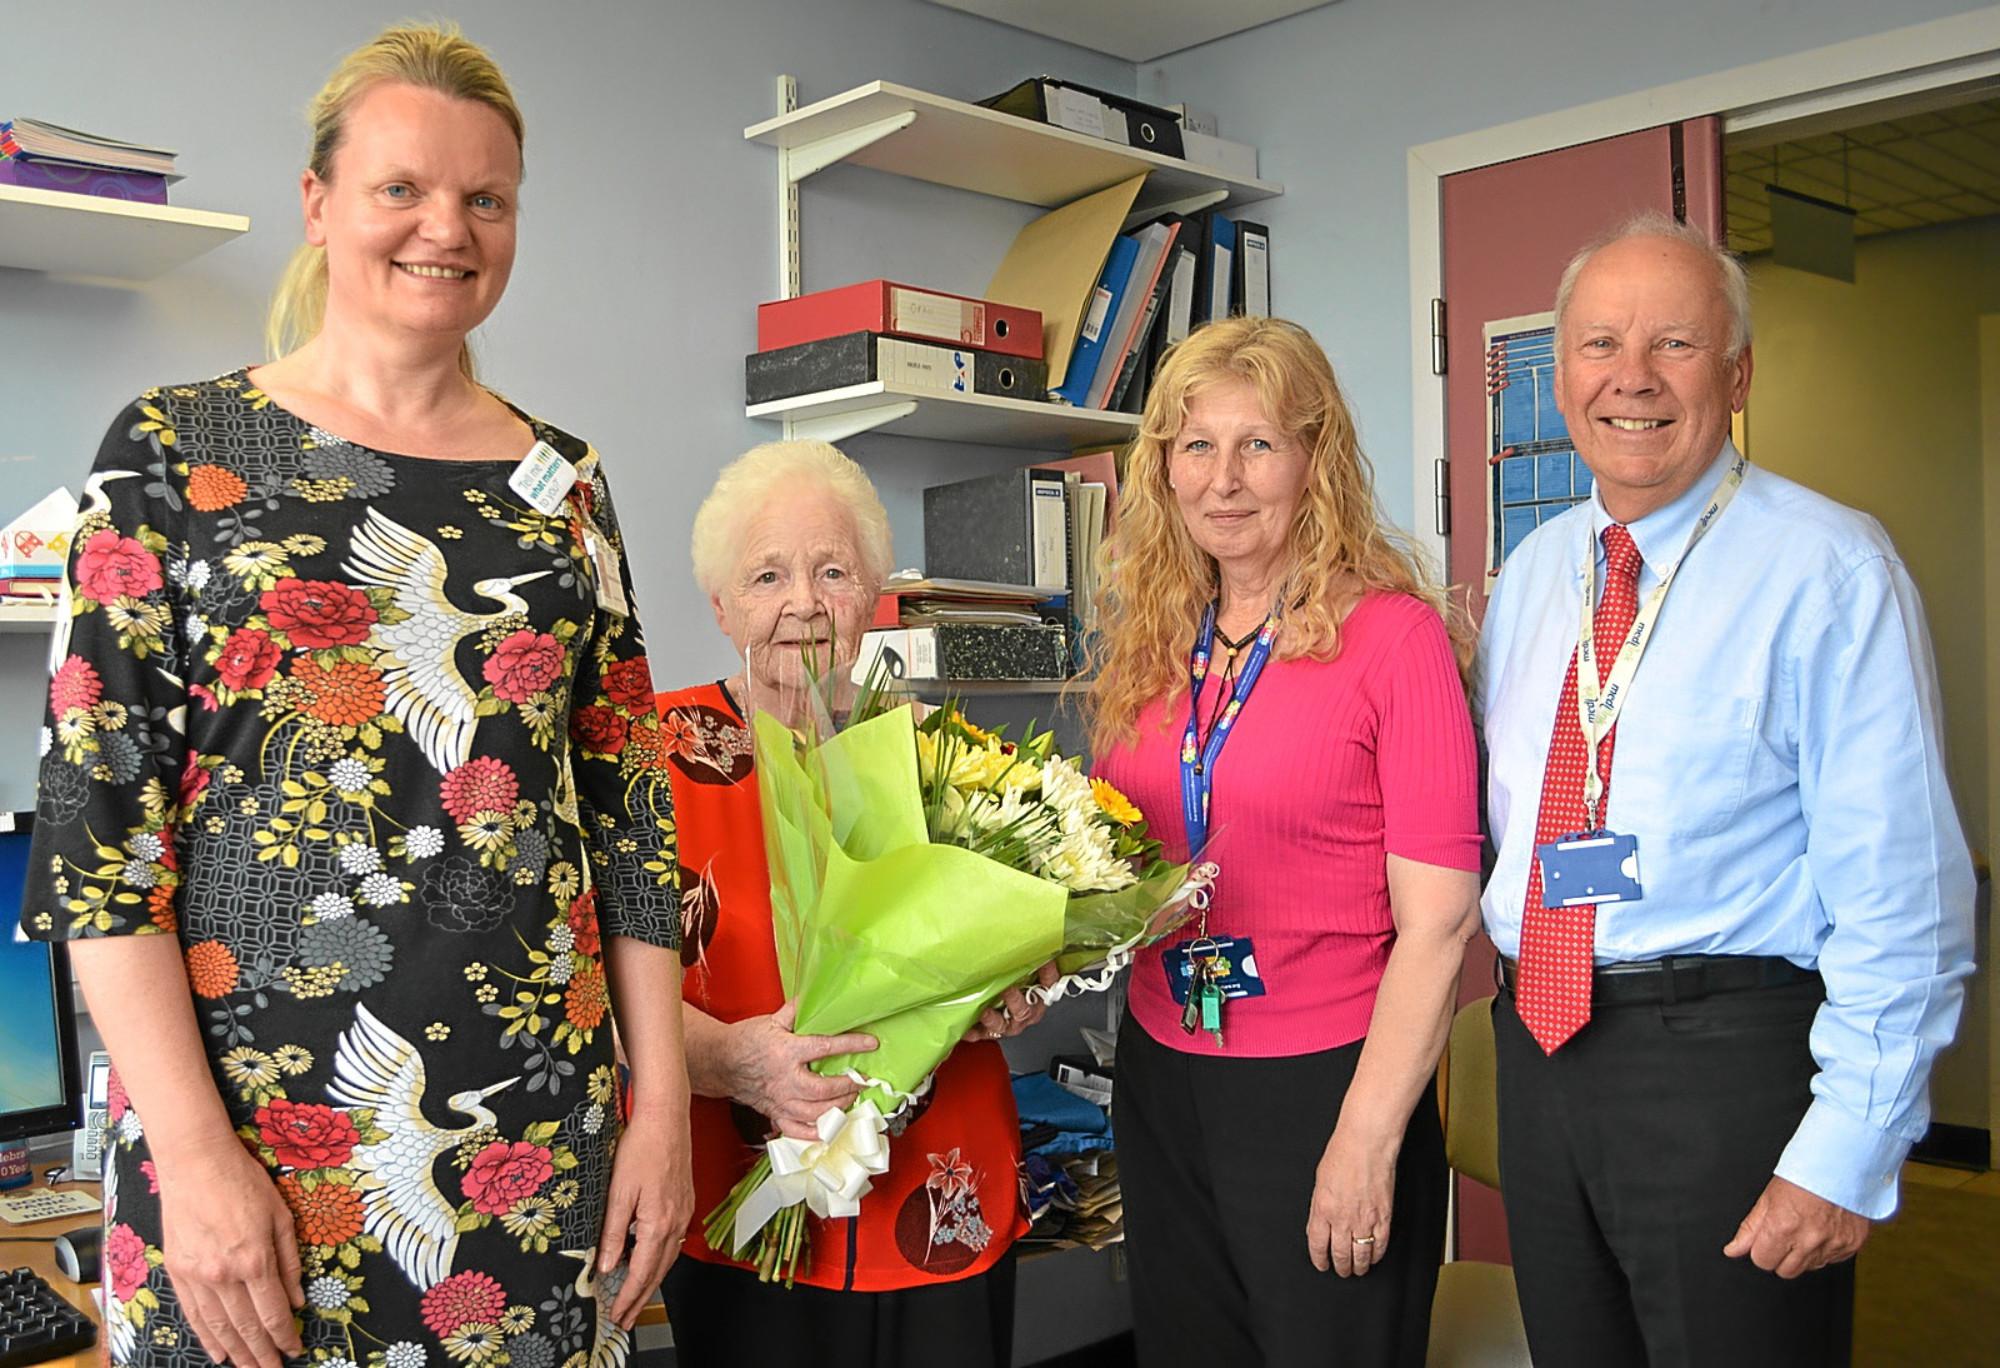 Long serving NHS Fife volunteer Helen Hagan celebrates 90th birthday. Pic shows L-R  Kathryn Brechin, Helen Hagan, Liz Nicol and Allan Burns.